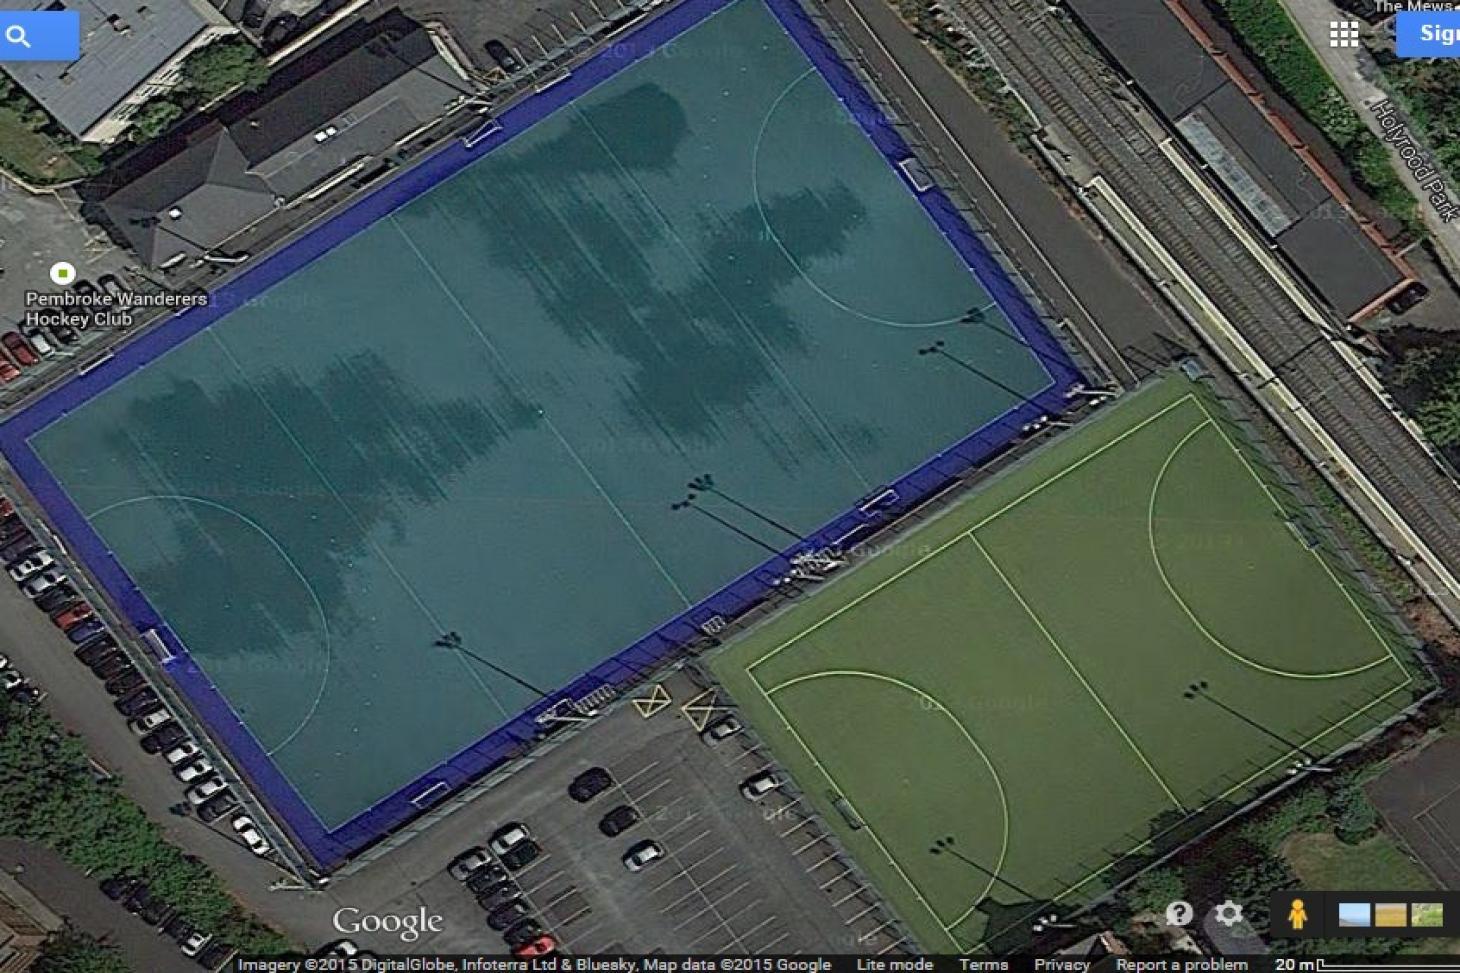 Pembroke Wanderers Hockey Club 5 a side | Astroturf football pitch